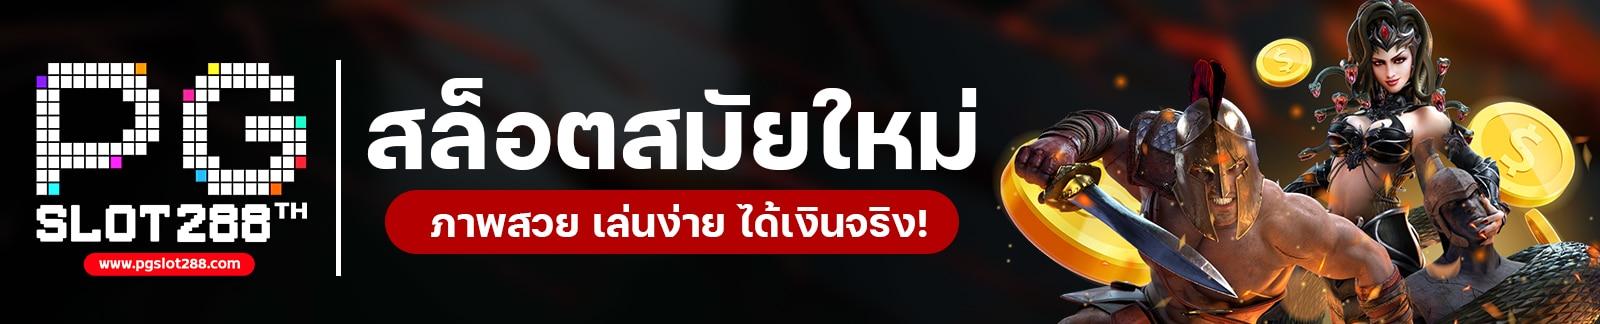 bn-pgslot168-3